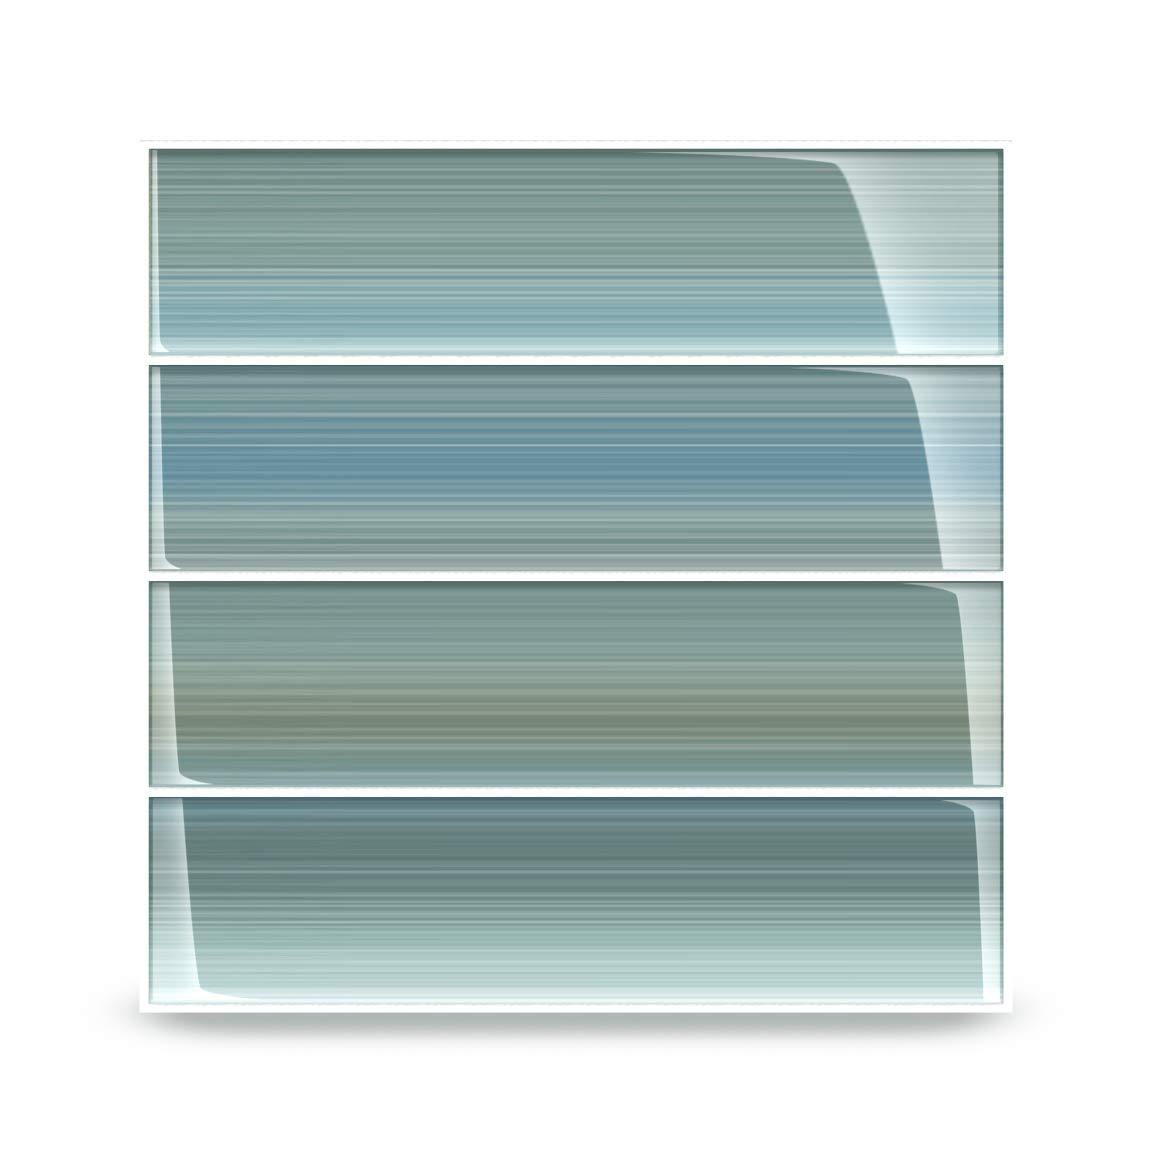 Bodesi Wintermoss Glass Subway Tile for Kitchen Backsplash or Bathroom, 3x12 by Bodesi - Mosaic and Glass Tile